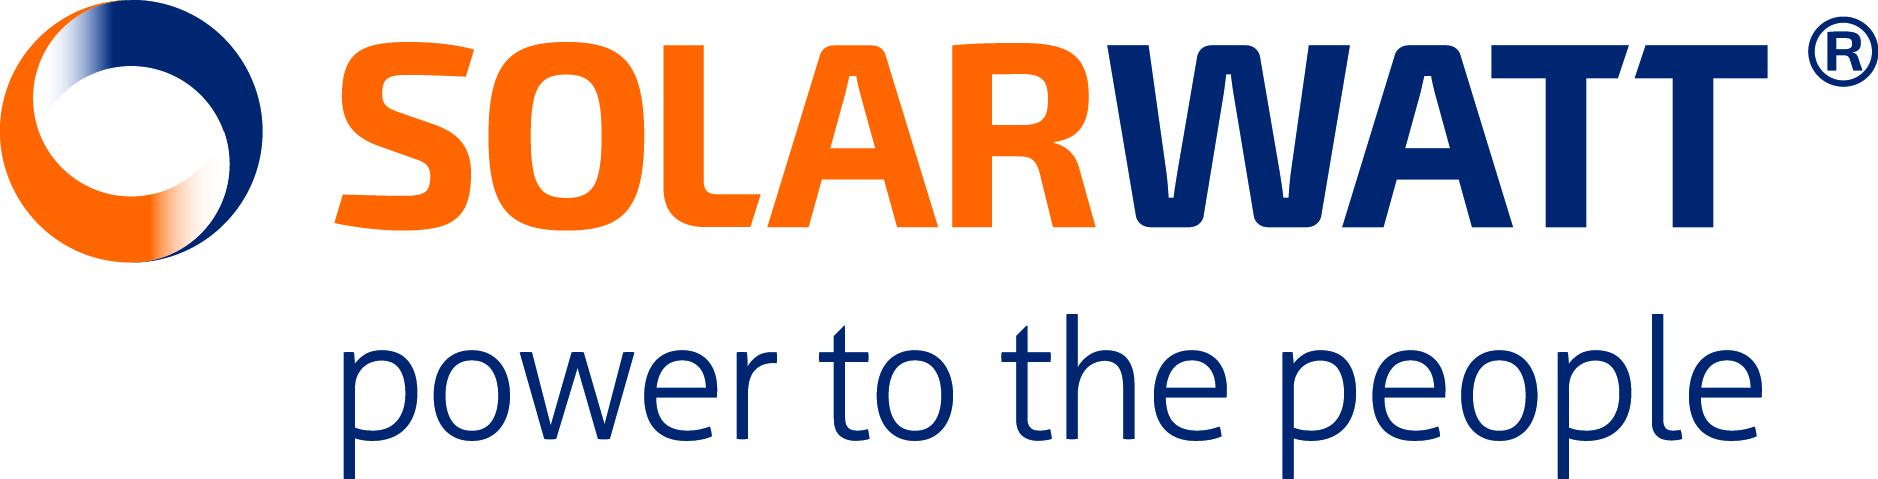 Brand Solarwatt PV Storage Energy Management